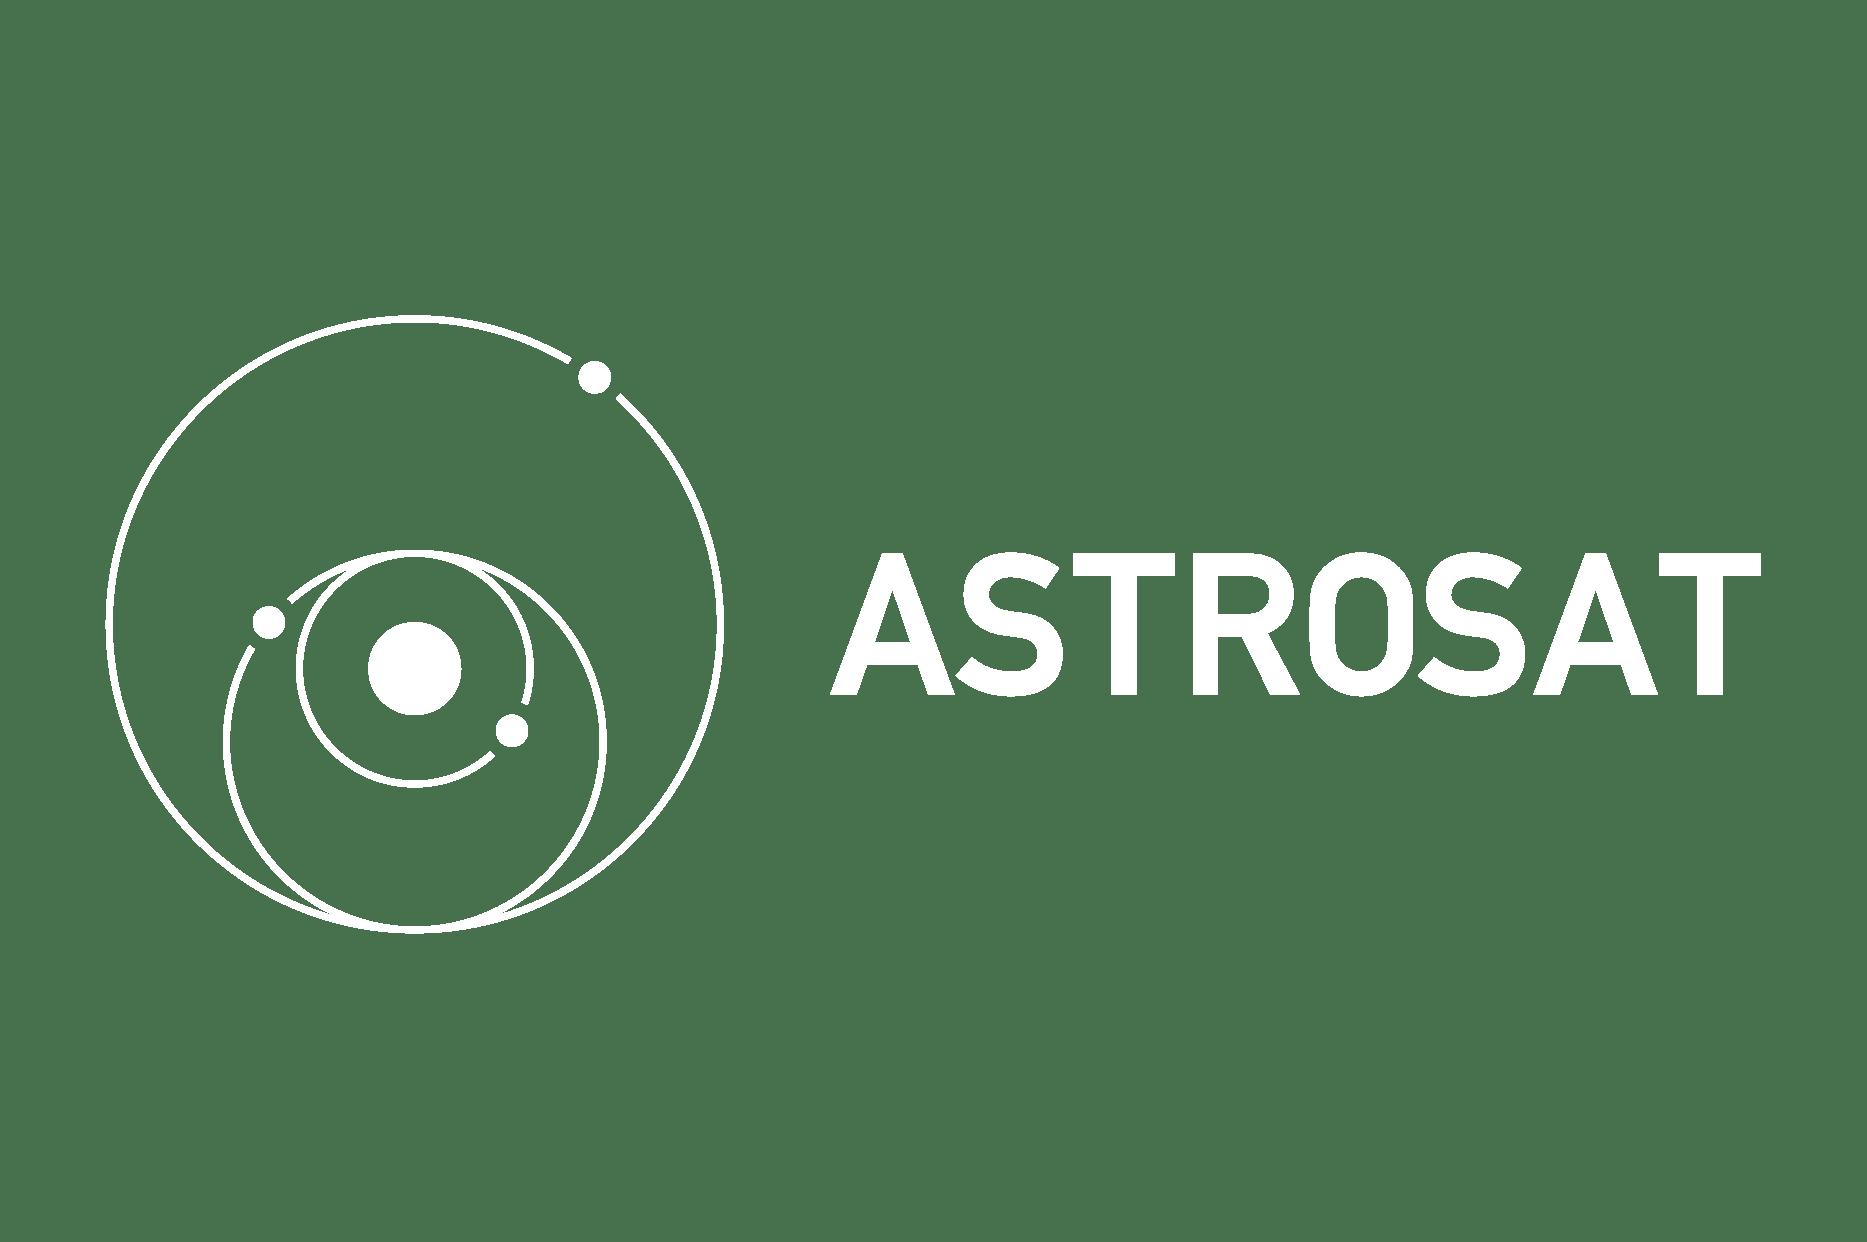 Astrosat Ltd